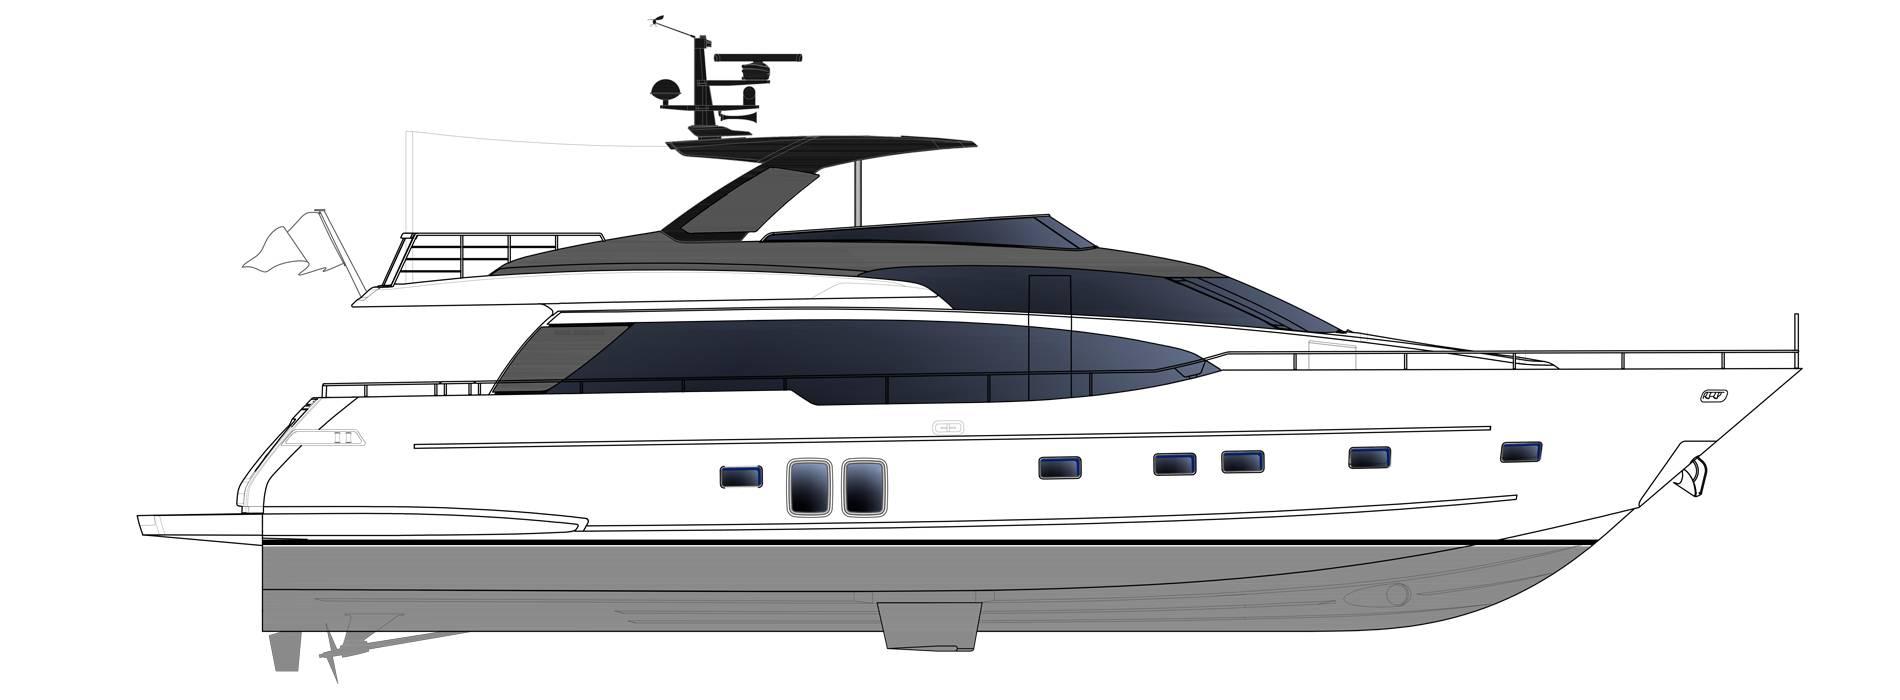 Sanlorenzo Yachts SL78-695 Perfil